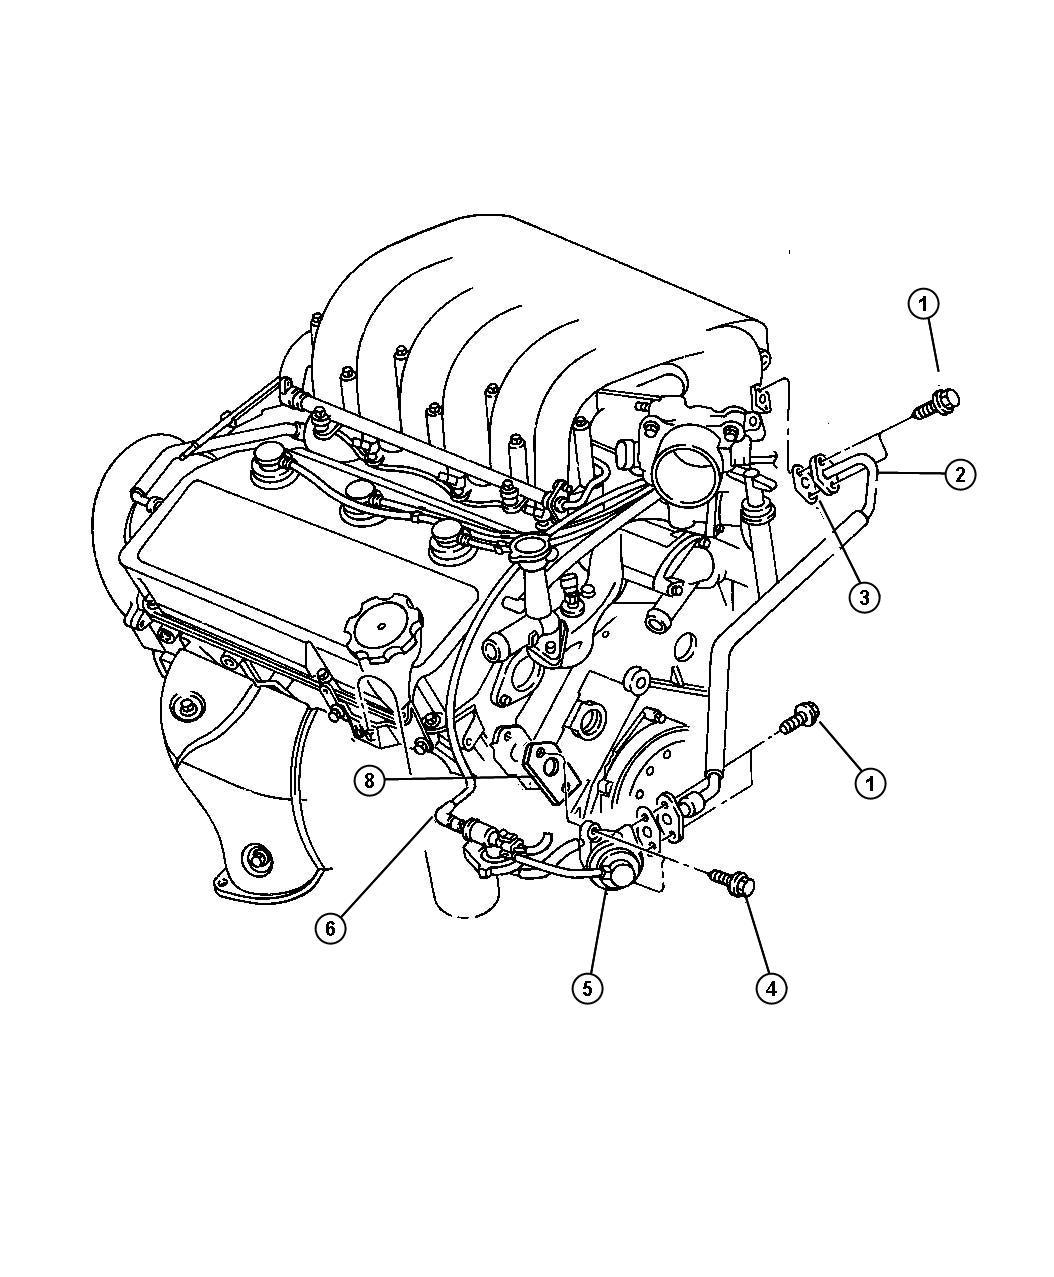 2000 Chrysler Cirrus EGR System 2.5L Engine